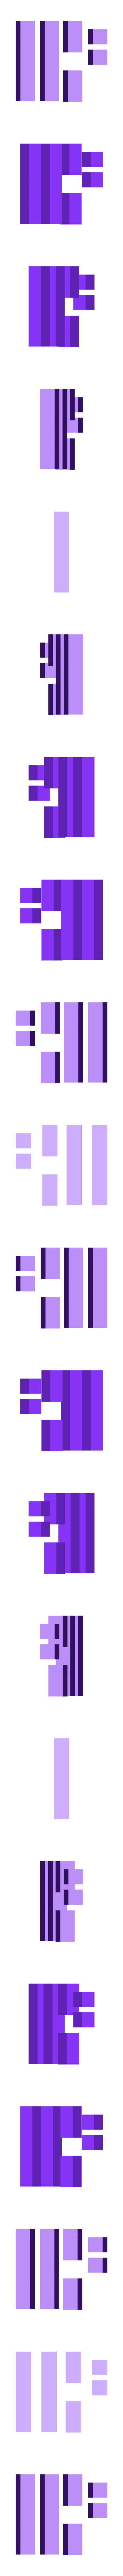 ORANGE_Dots.stl Download free STL file Octorok 8-Bits • 3D printing template, conceptify